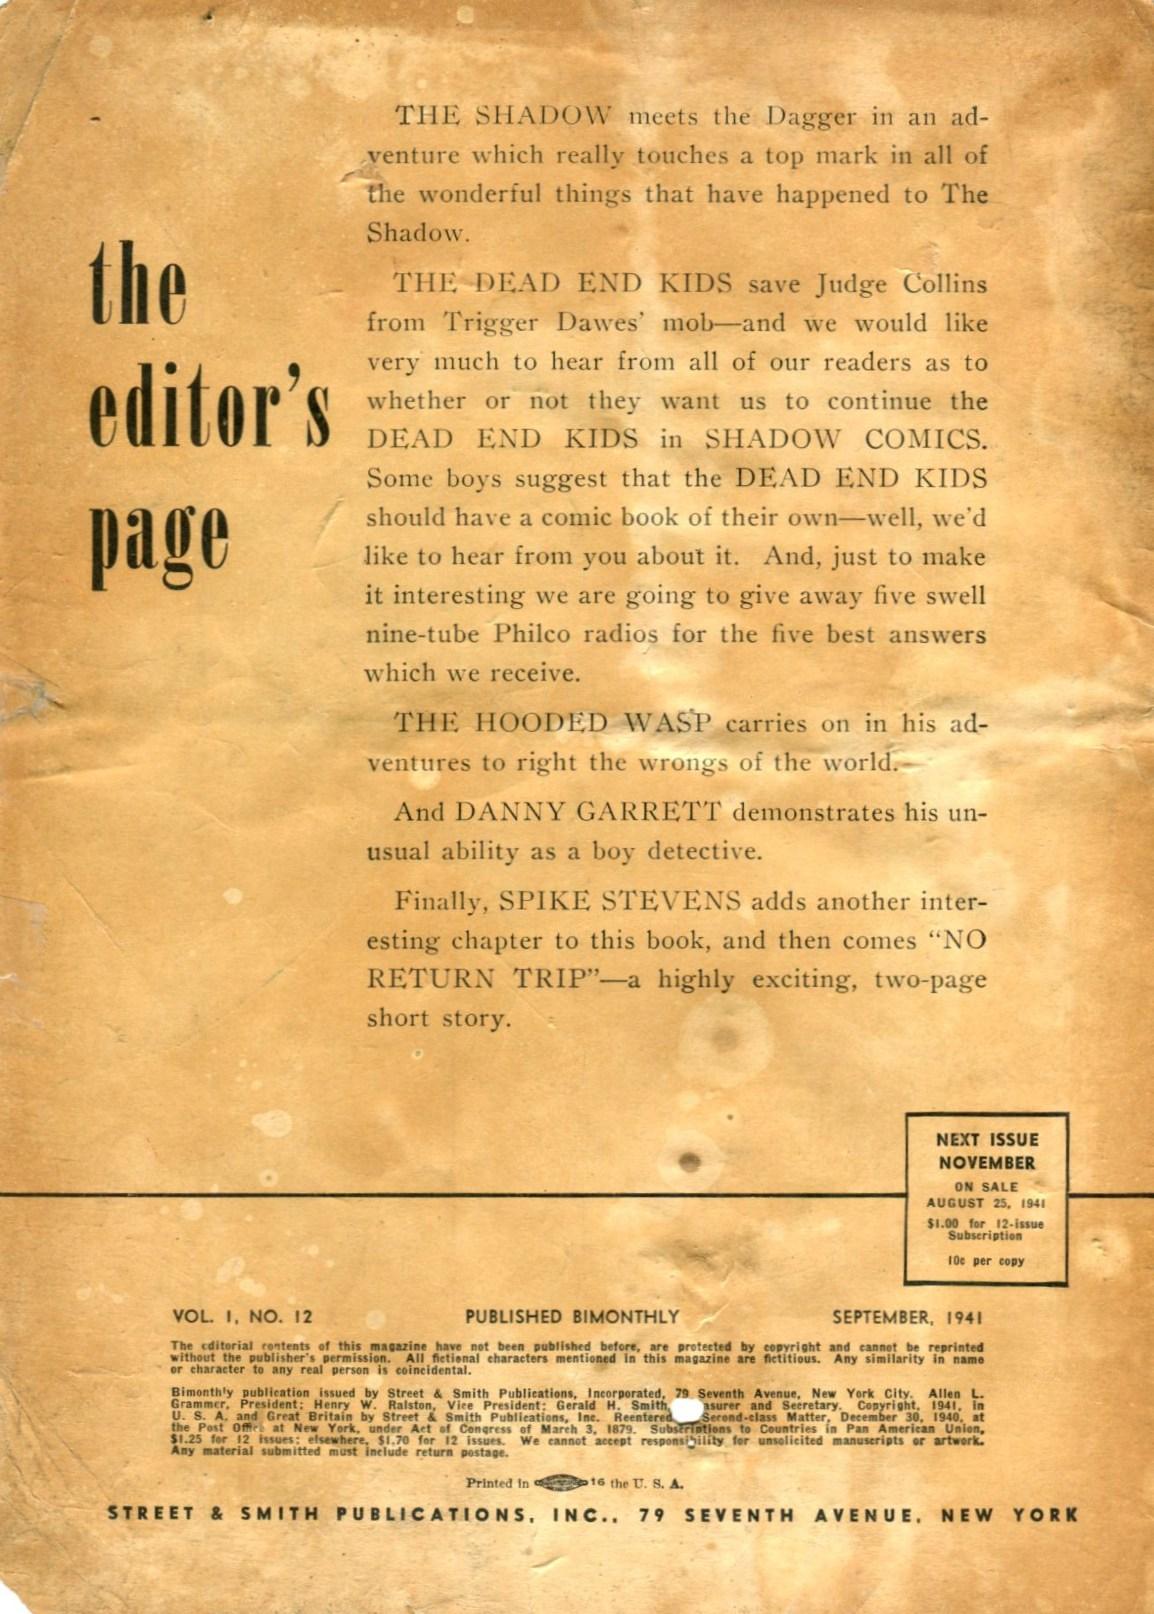 Read online Shadow Comics comic -  Issue #12 - 2